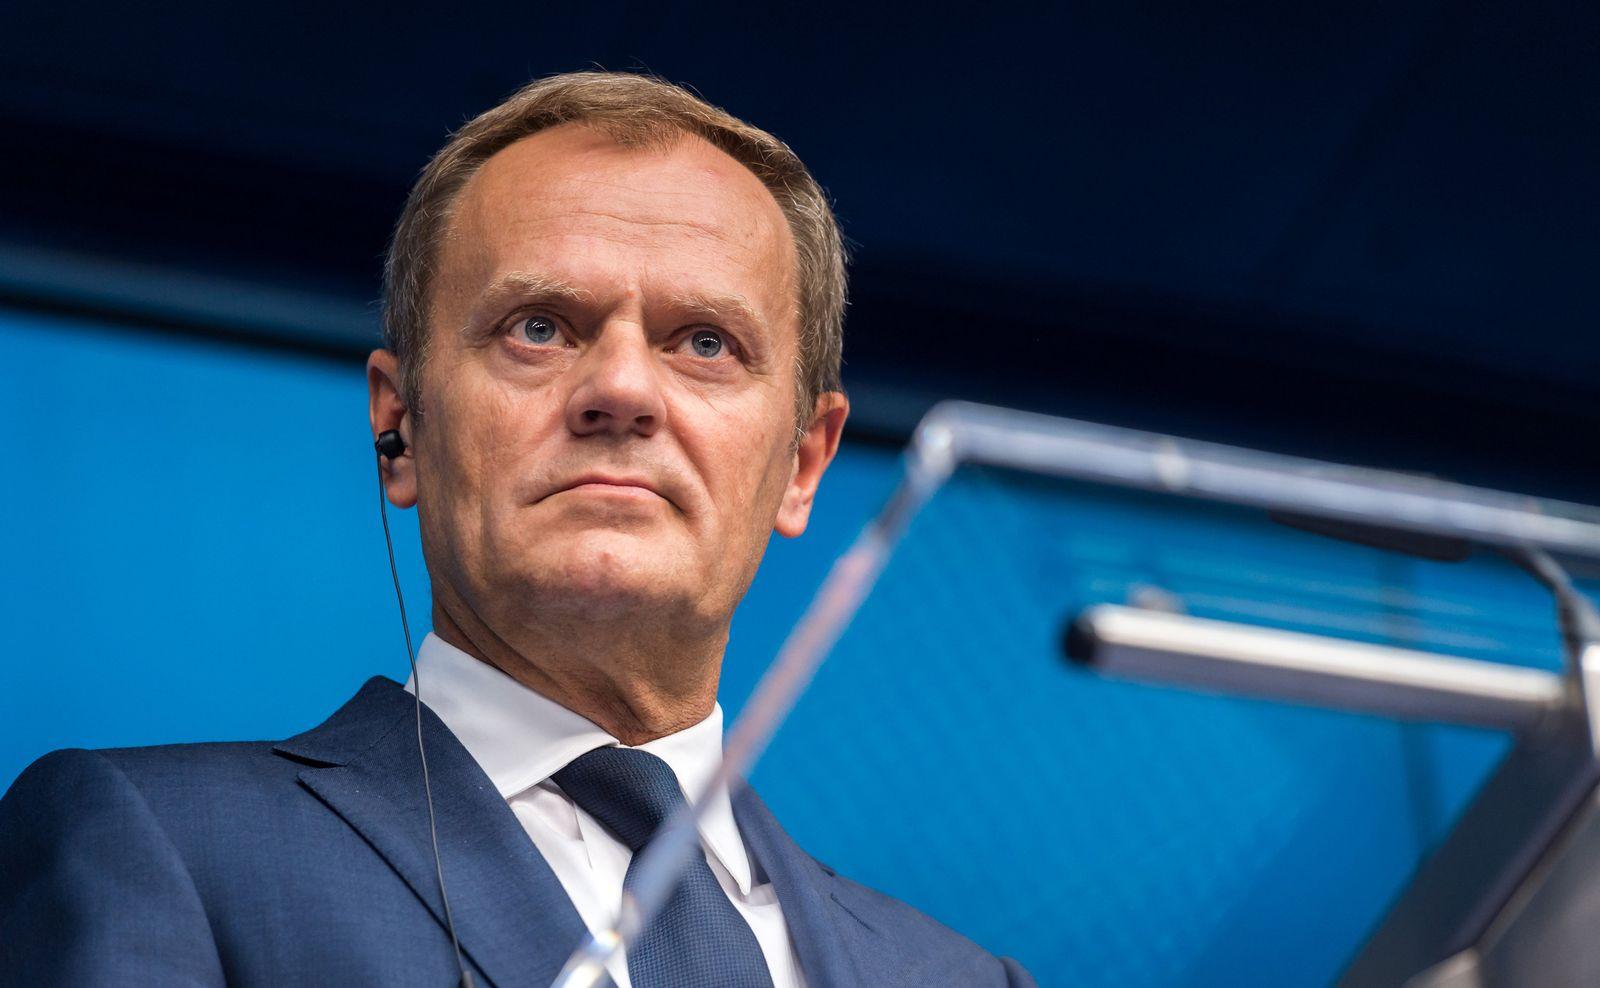 Donald Tusk/ EU-Sondergipfel abgesagt